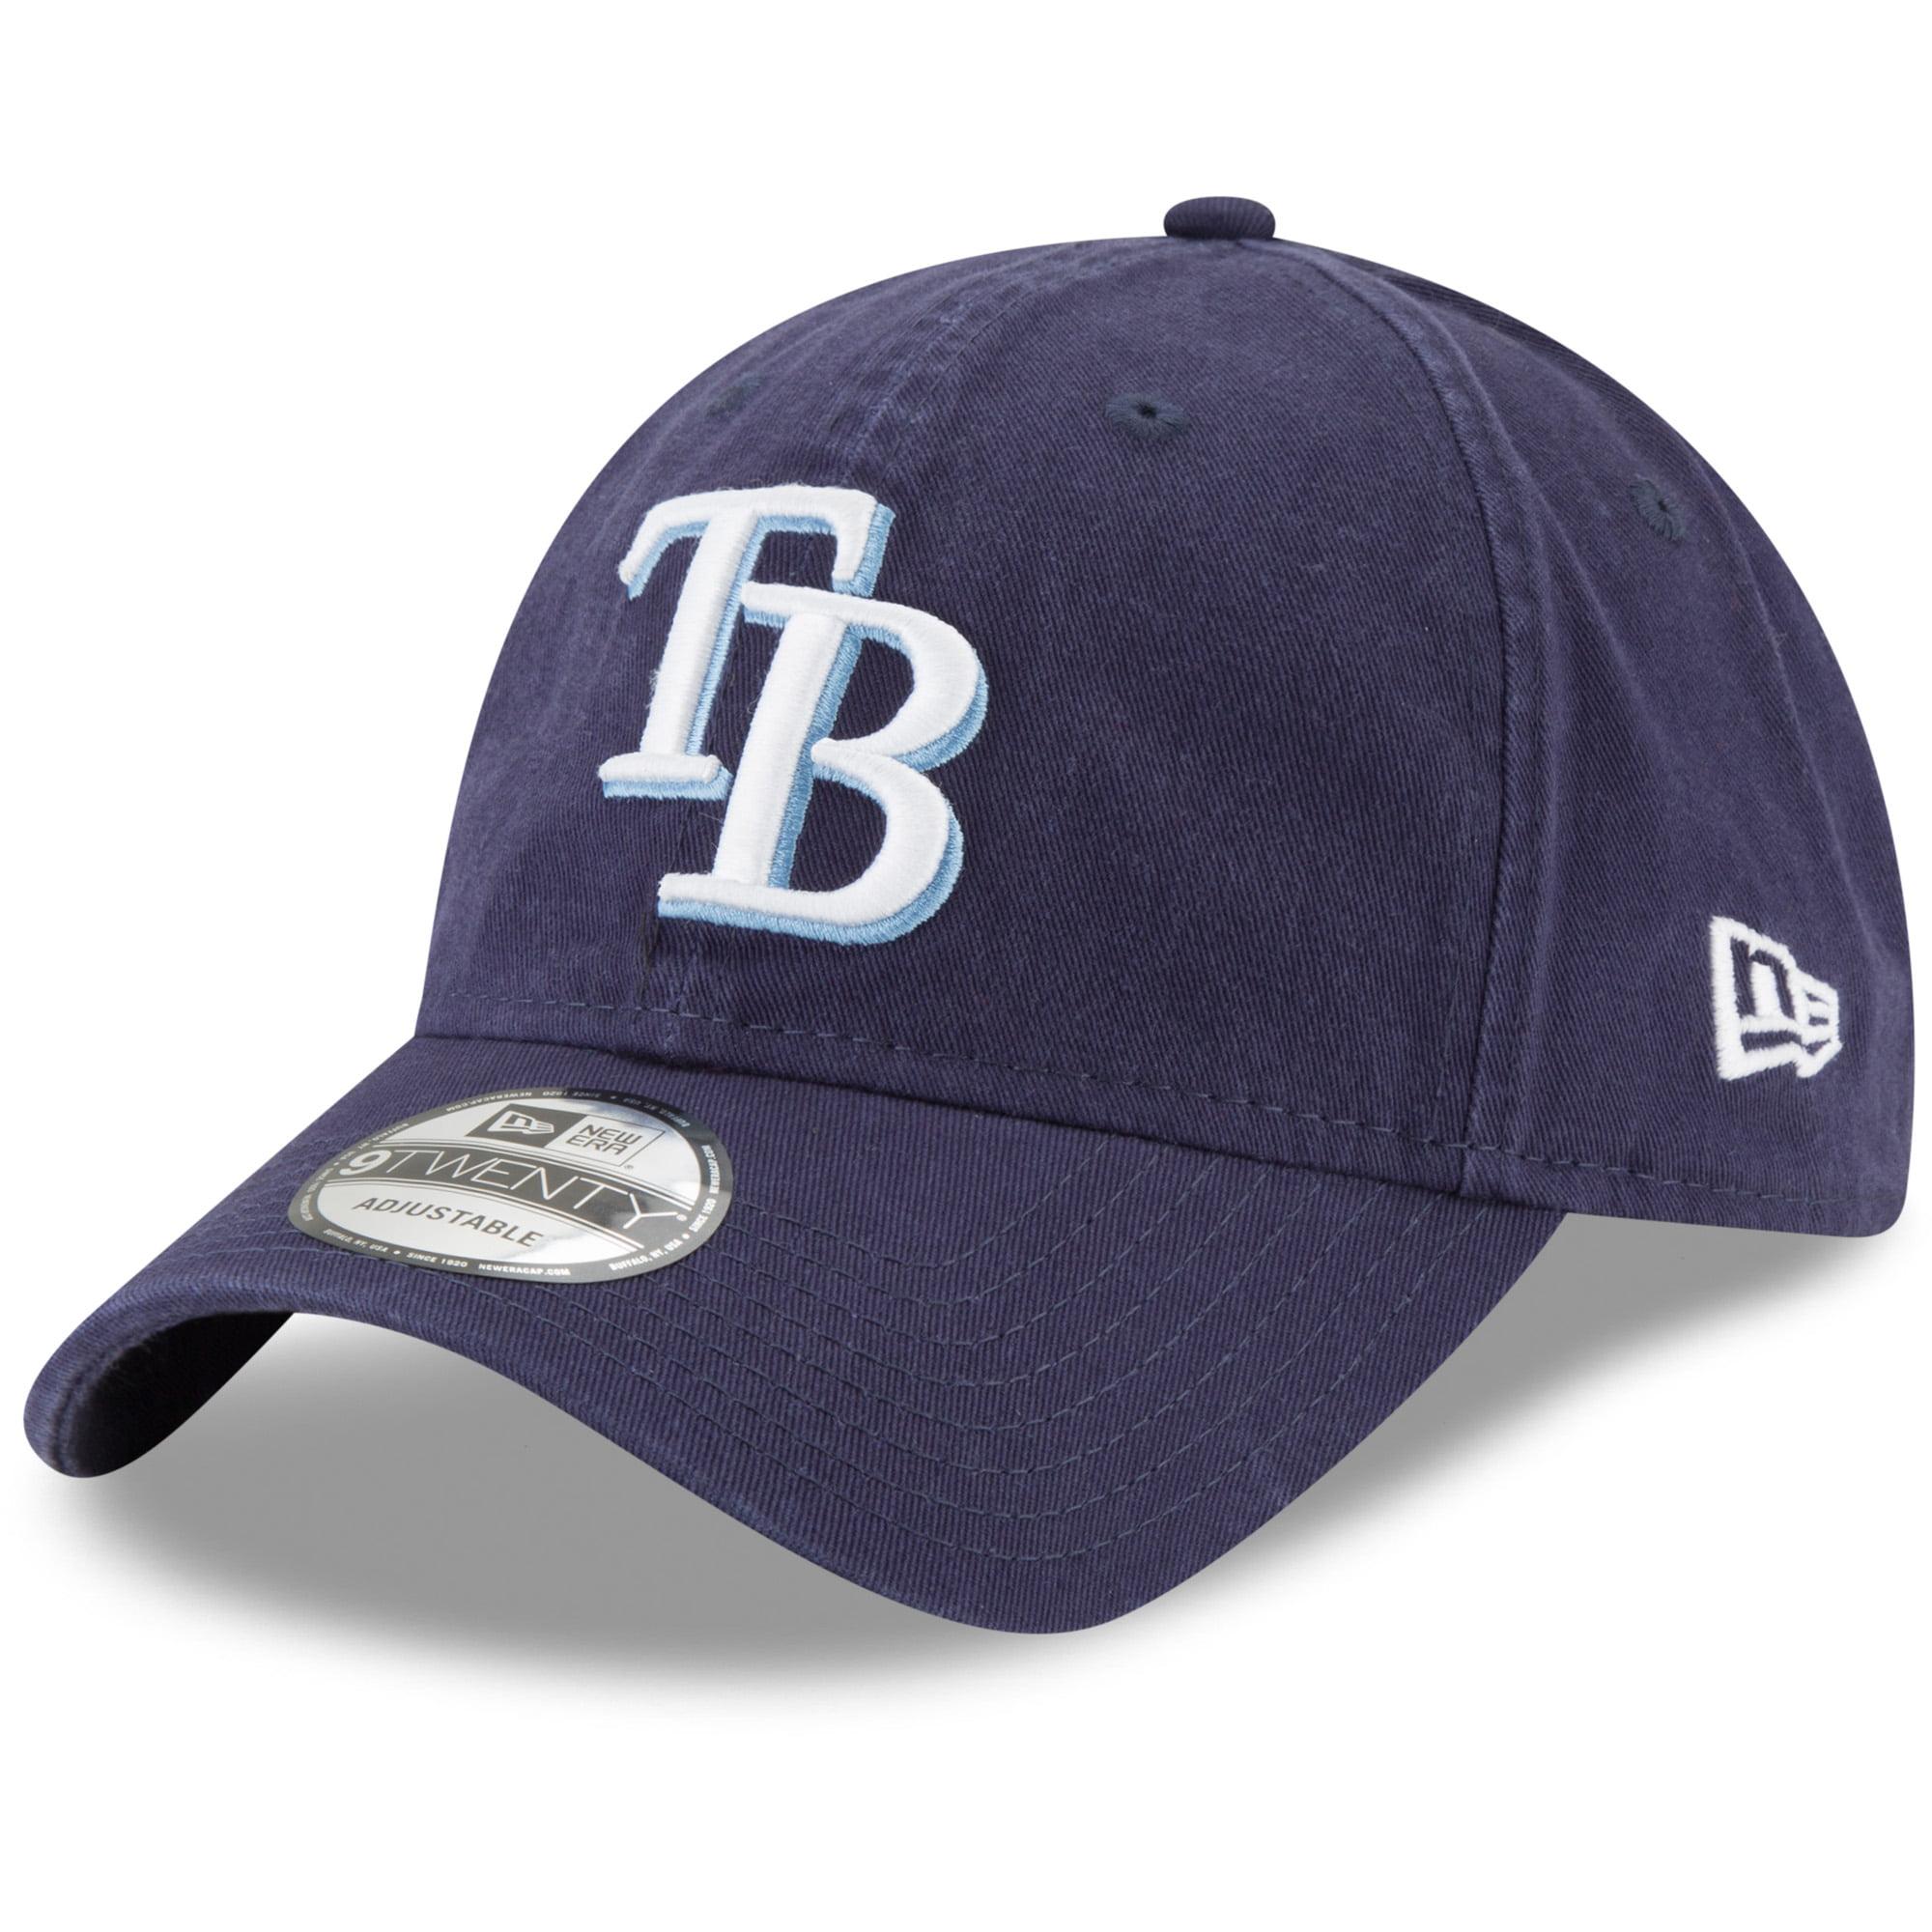 Tampa Bay Rays New Era Youth Core Classic Replica 9TWENTY Adjustable Hat - Navy - OSFA